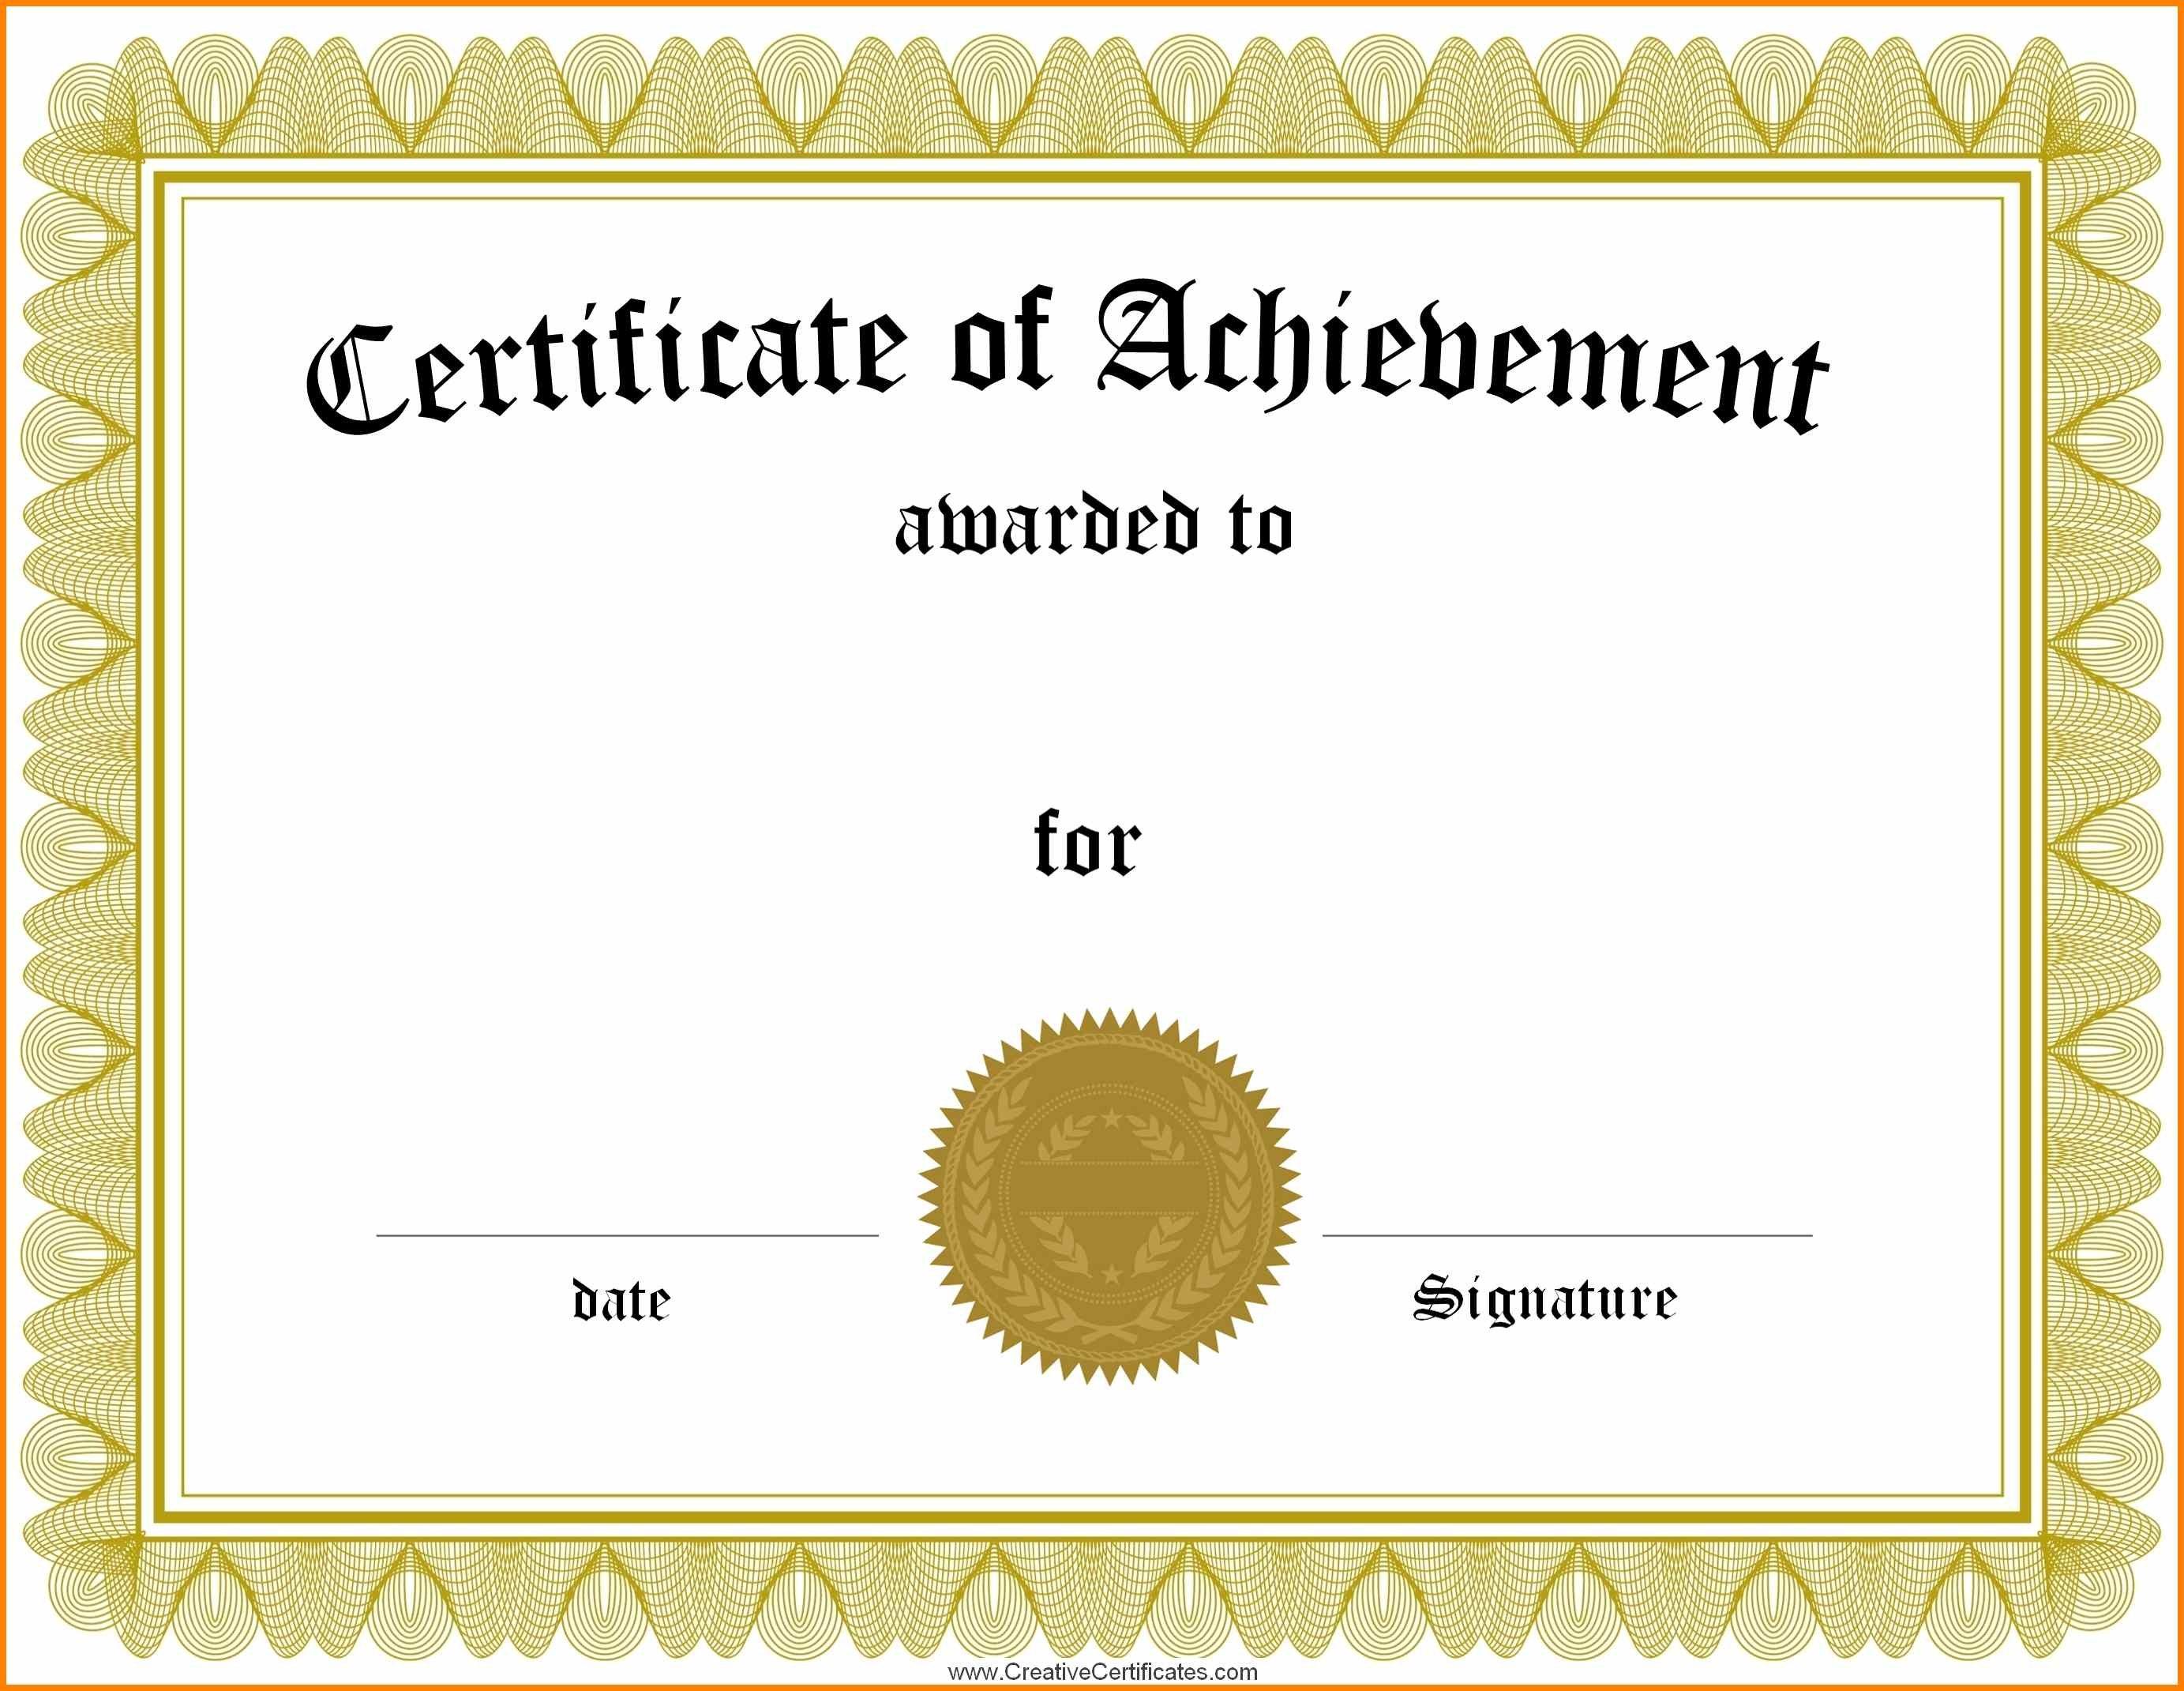 Generic Certificate Template  Sansurabionetassociats Within Mock Certificate Template